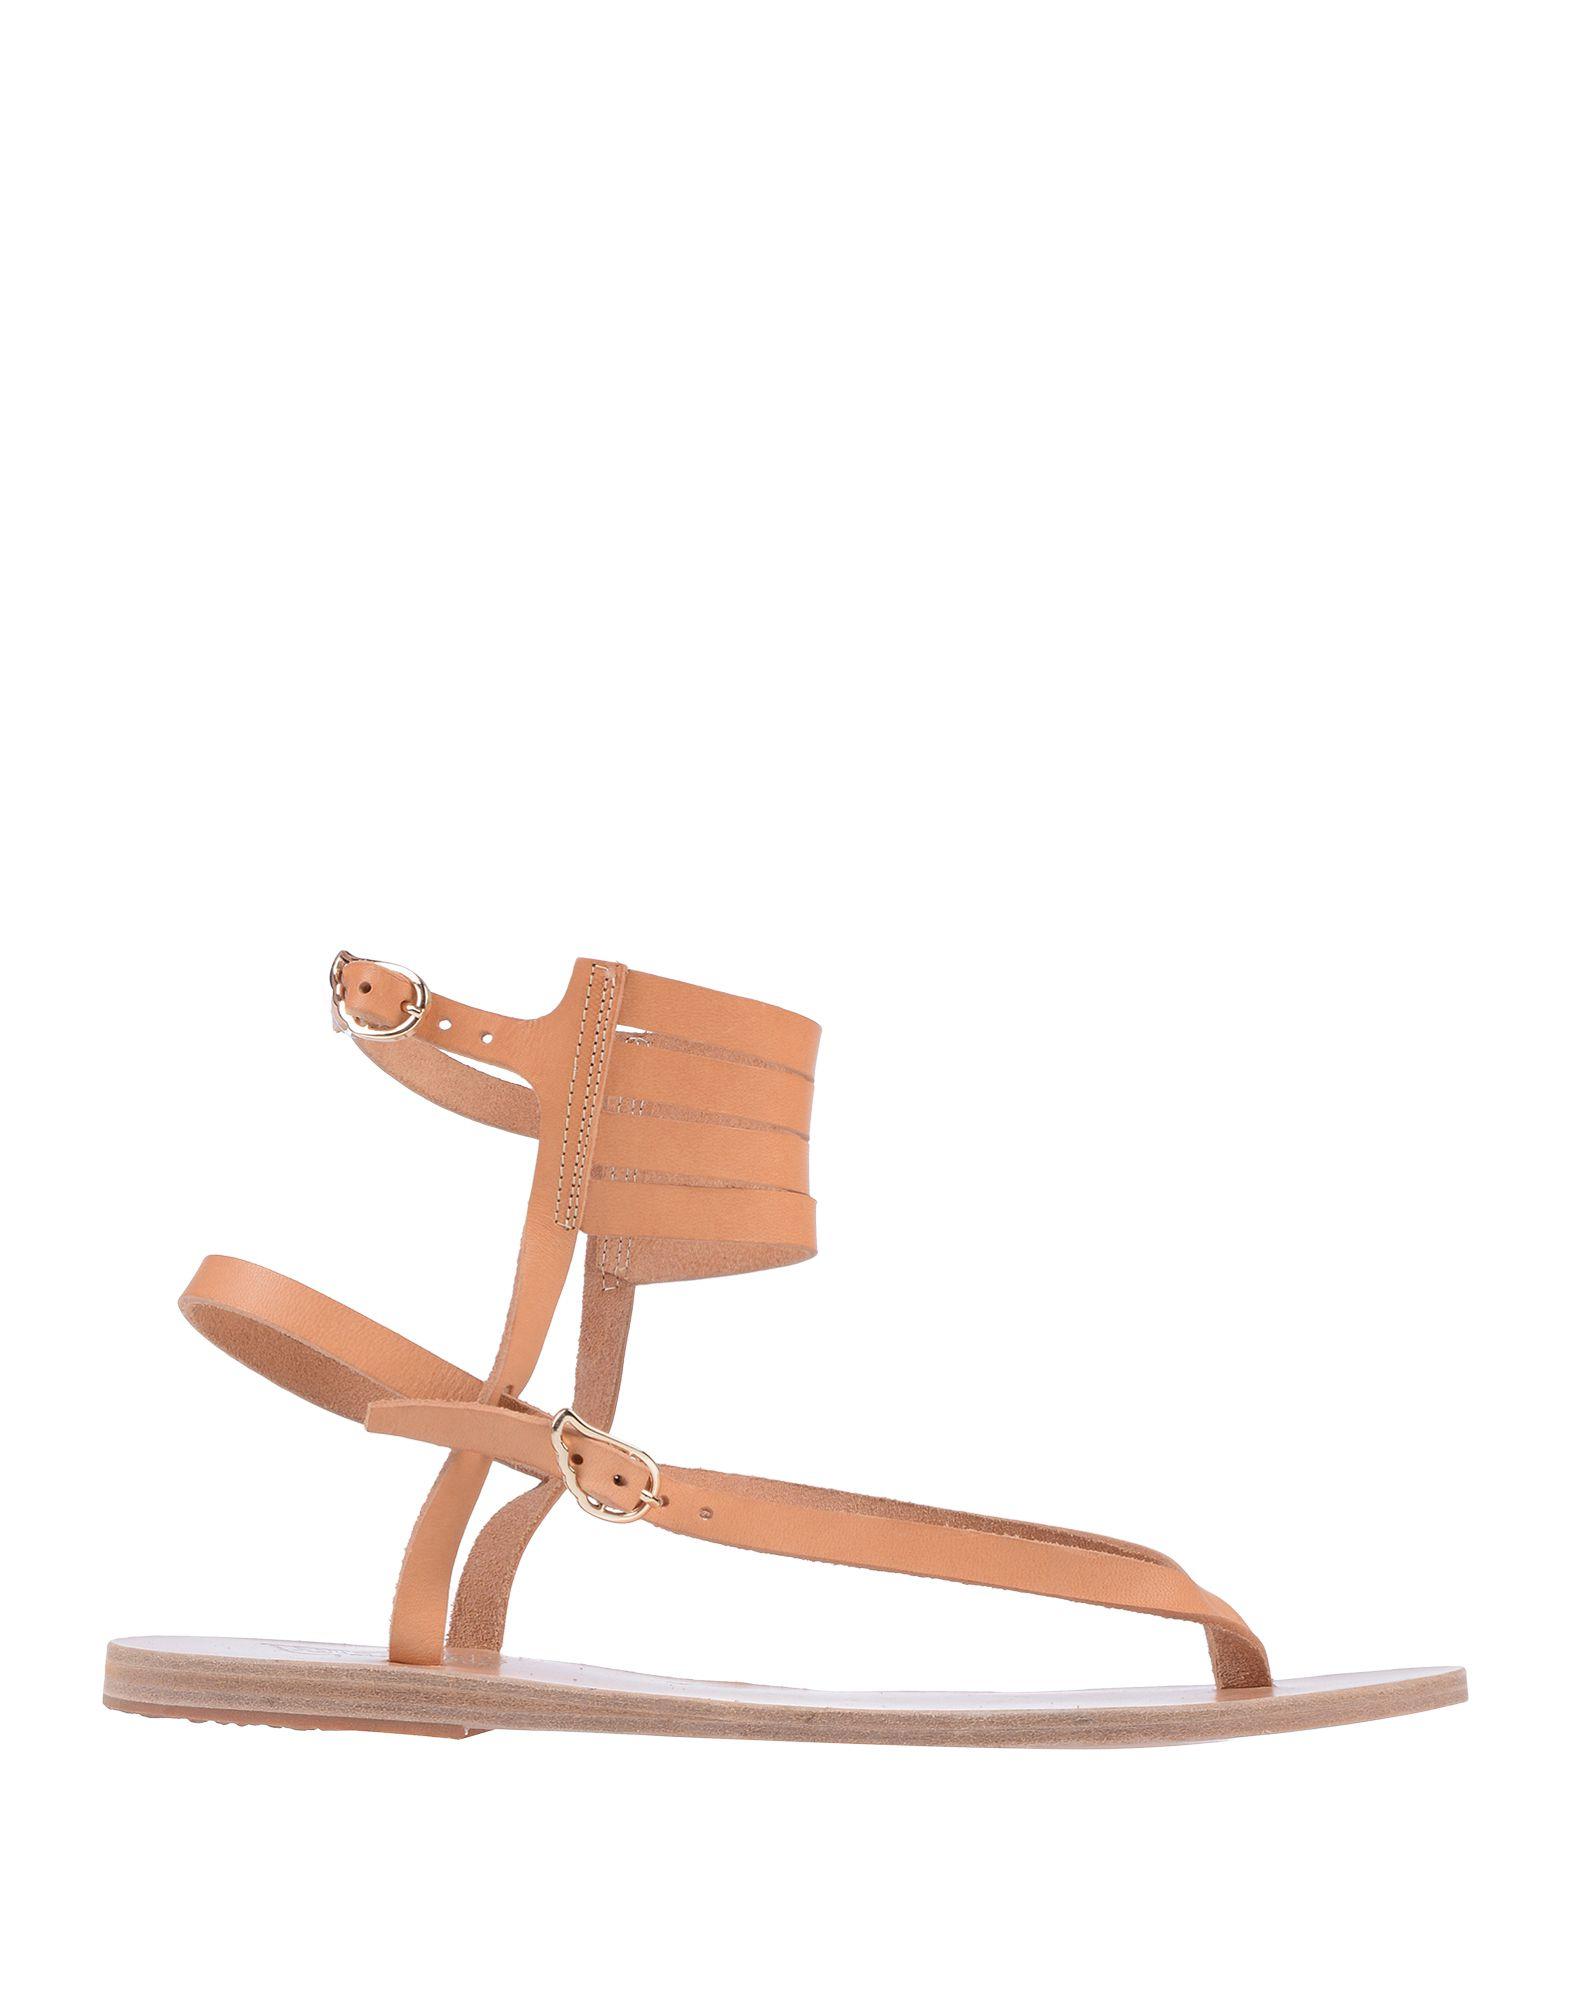 ANCIENT GREEK SANDALS Вьетнамки 2018 women sandals flat with shoes bandage bohemia leisure lady sandals peep toe outdoor women s summer footwear shoes 3 27